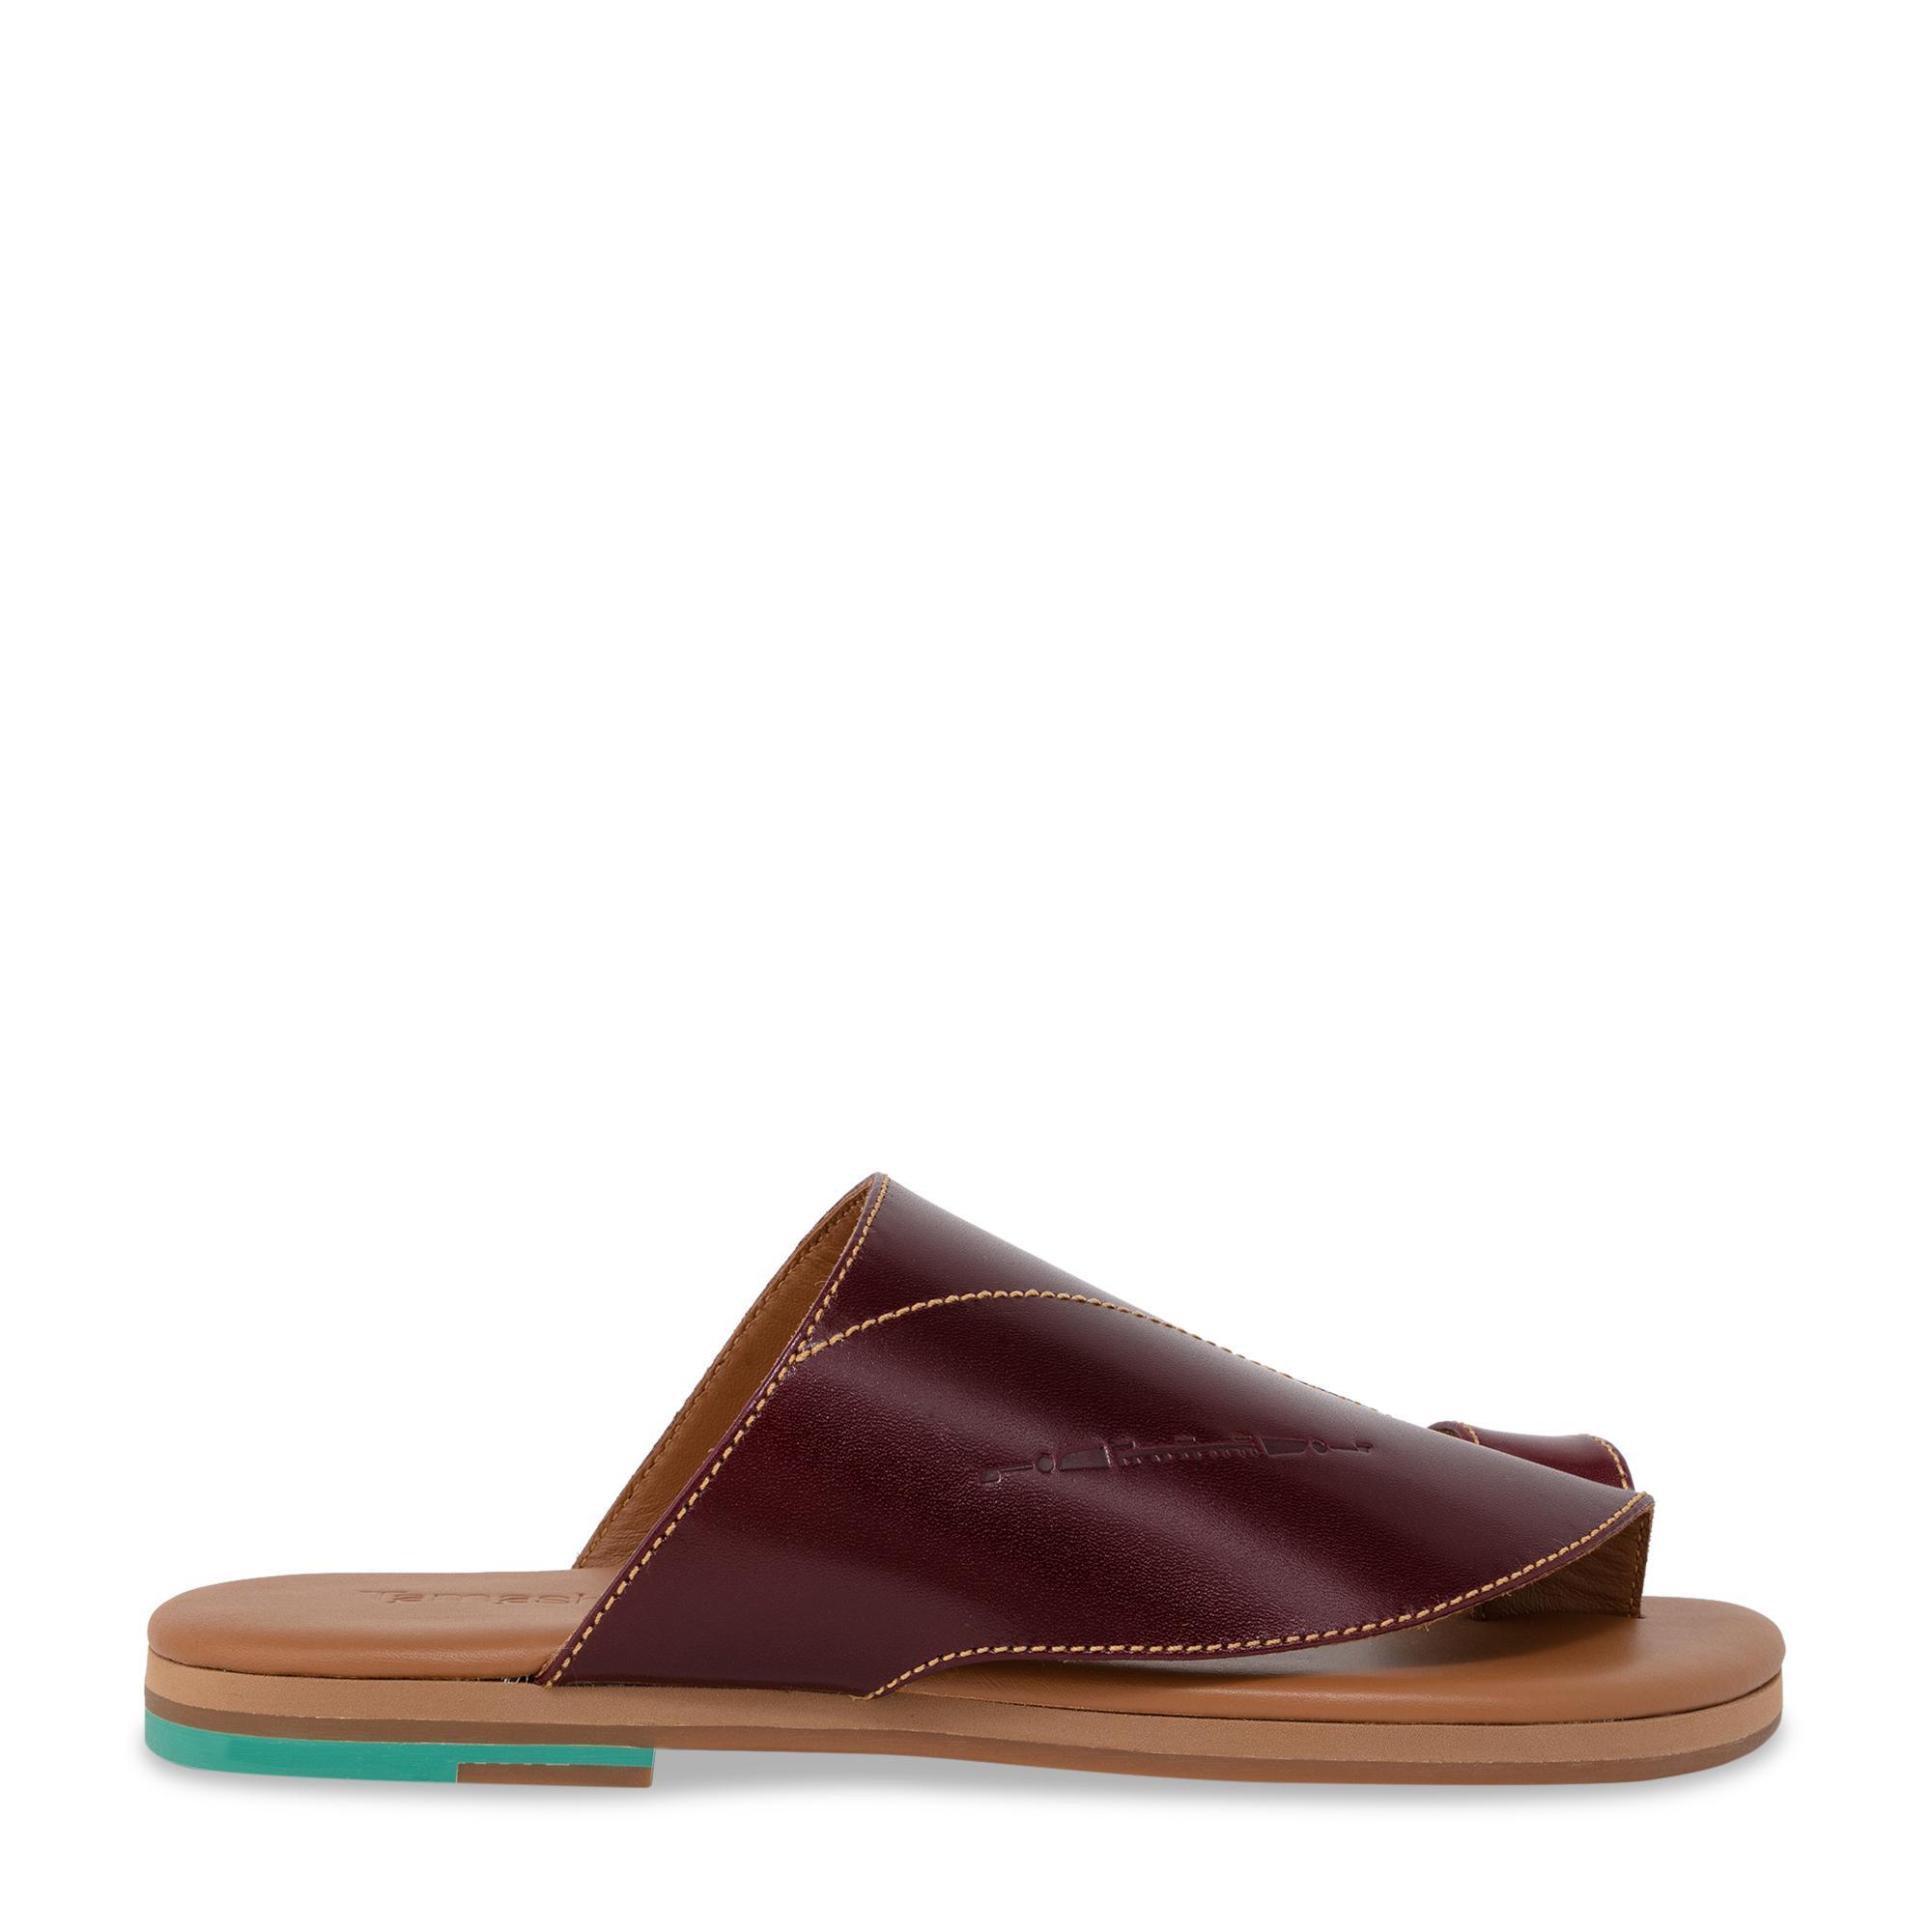 Jiwan sandals